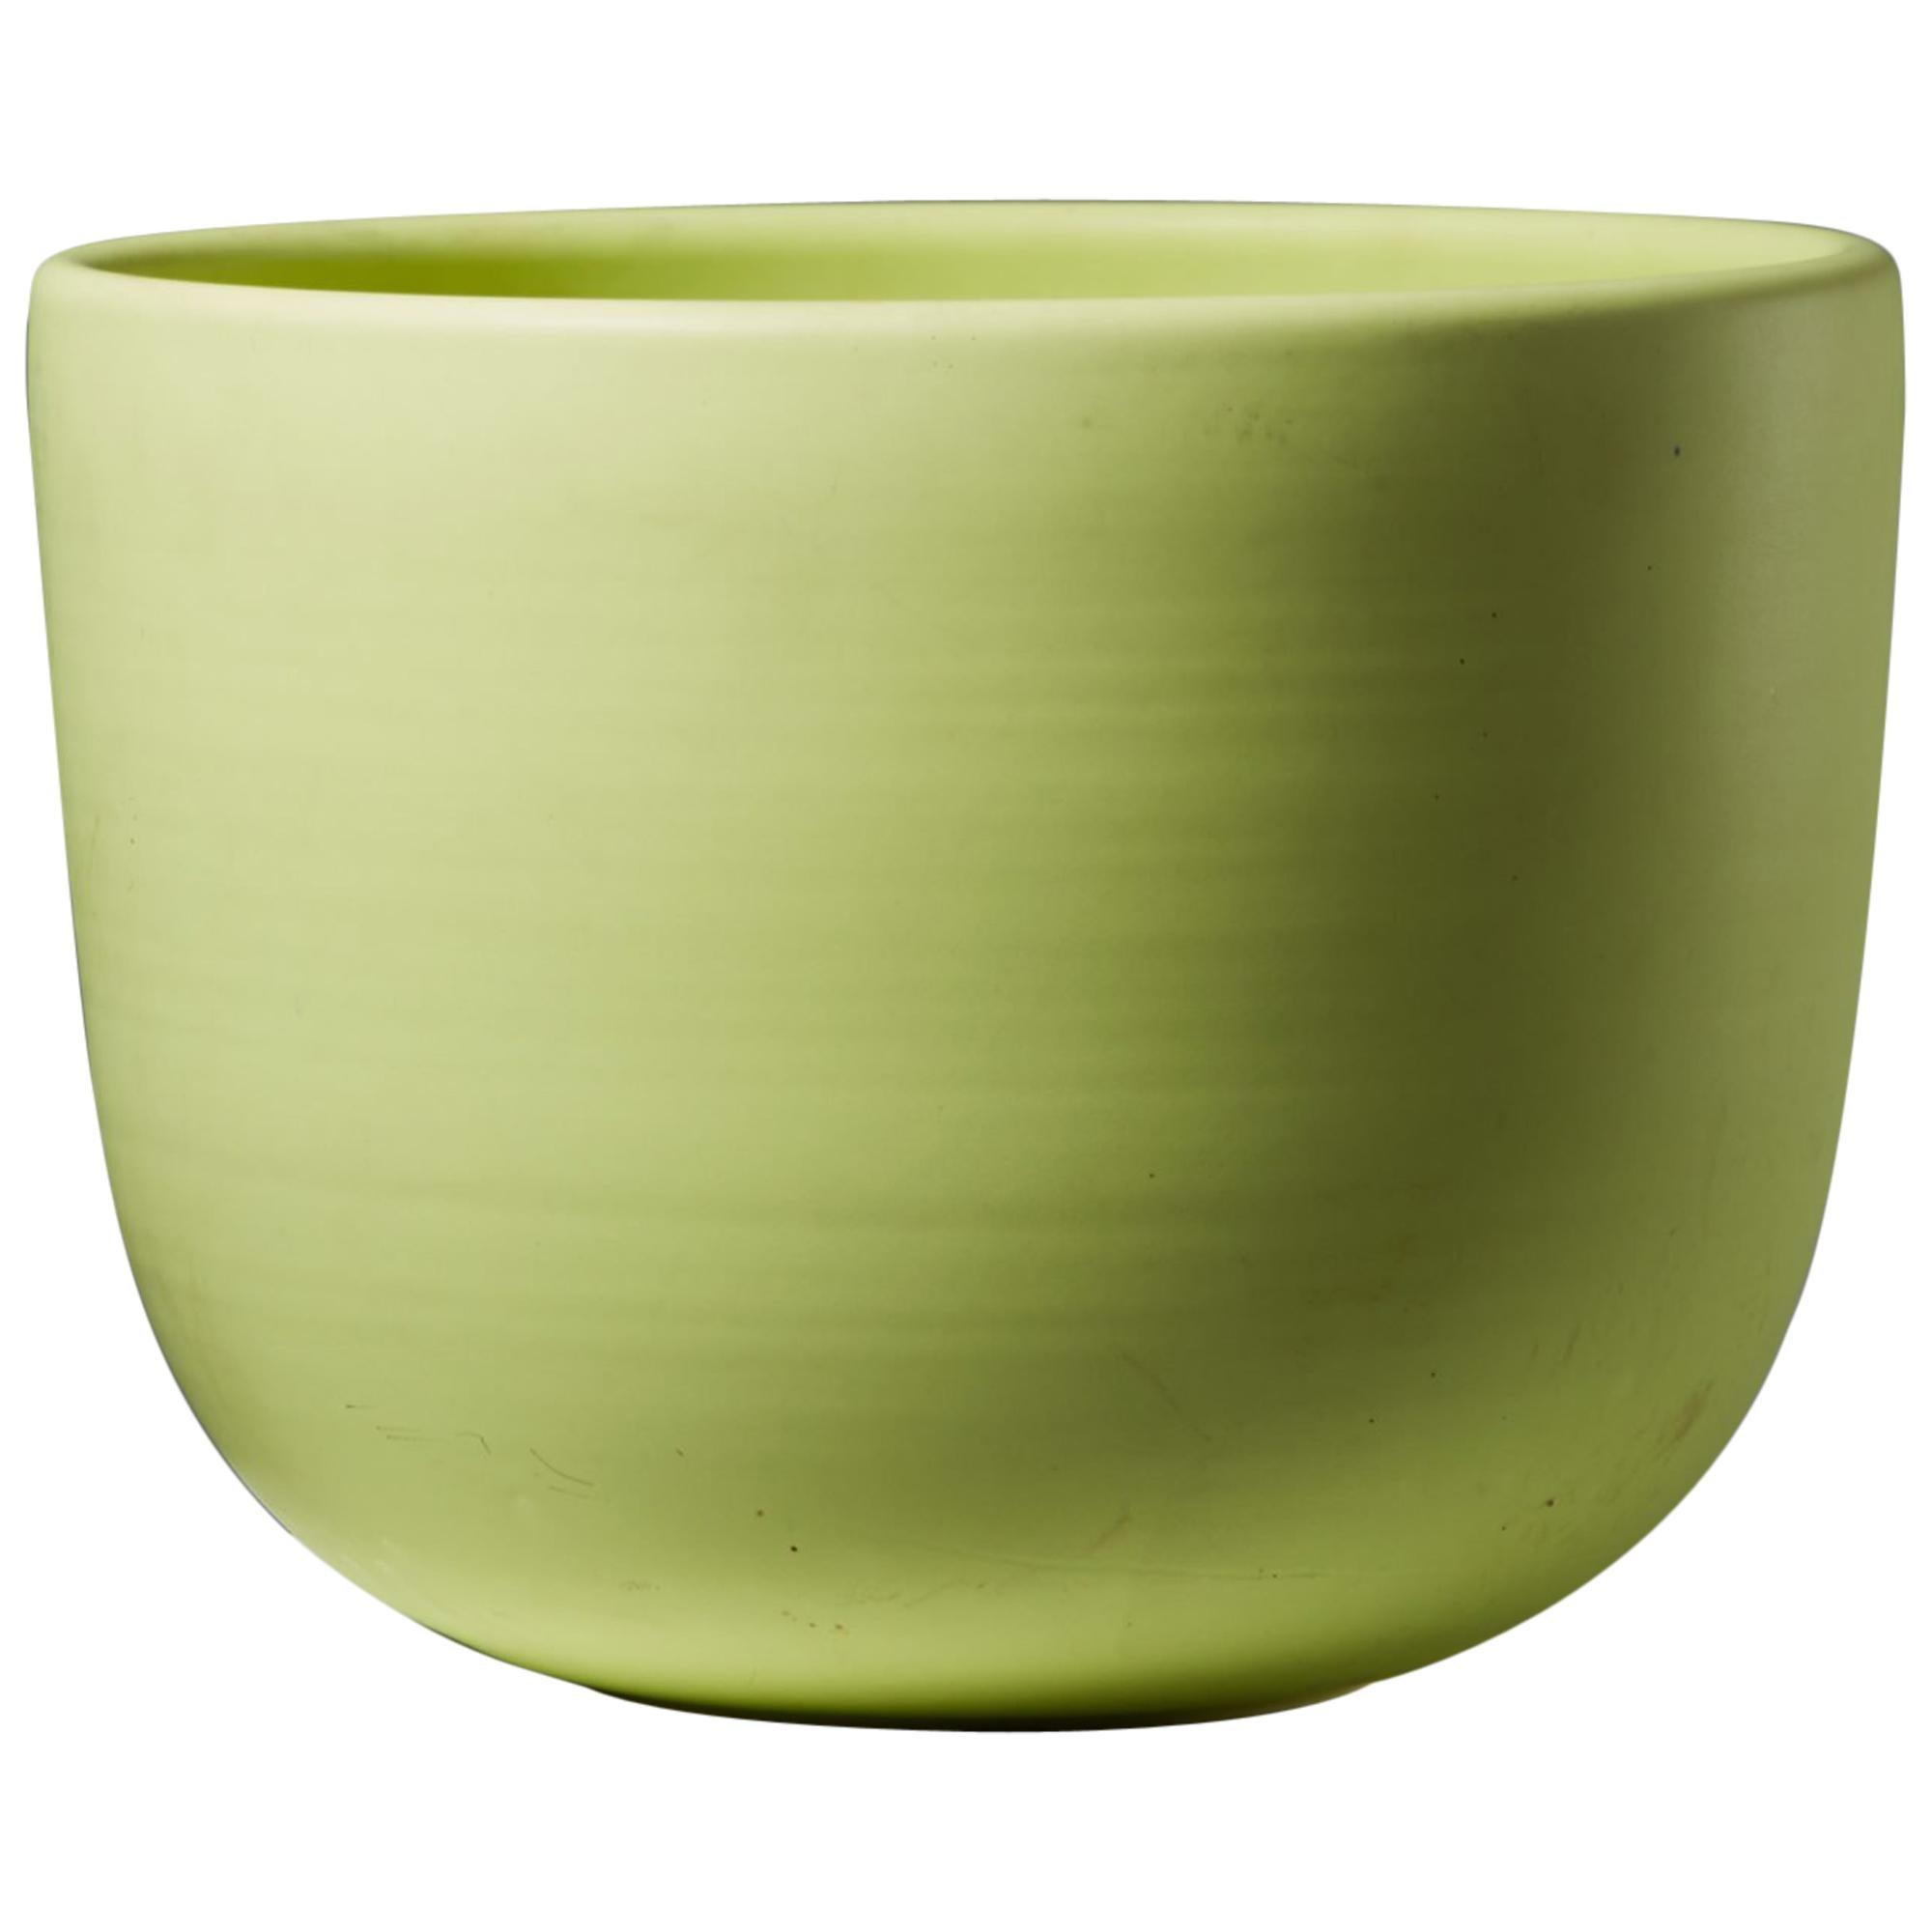 Bowl Designed by Inger Persson for Rörstrand, Sweden, 1960s